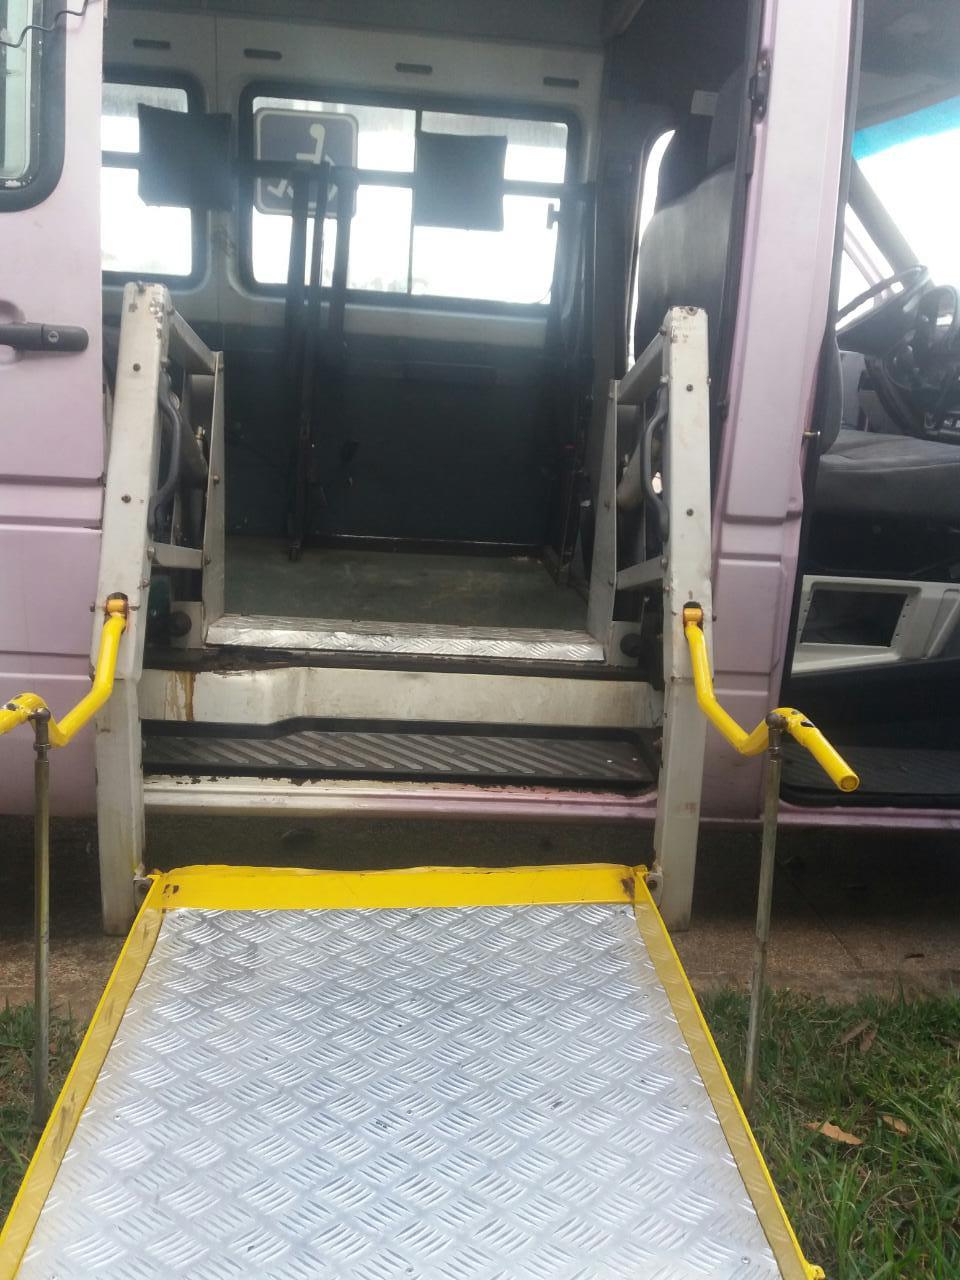 Foto do elevador para cadeirantes existente na van adaptada